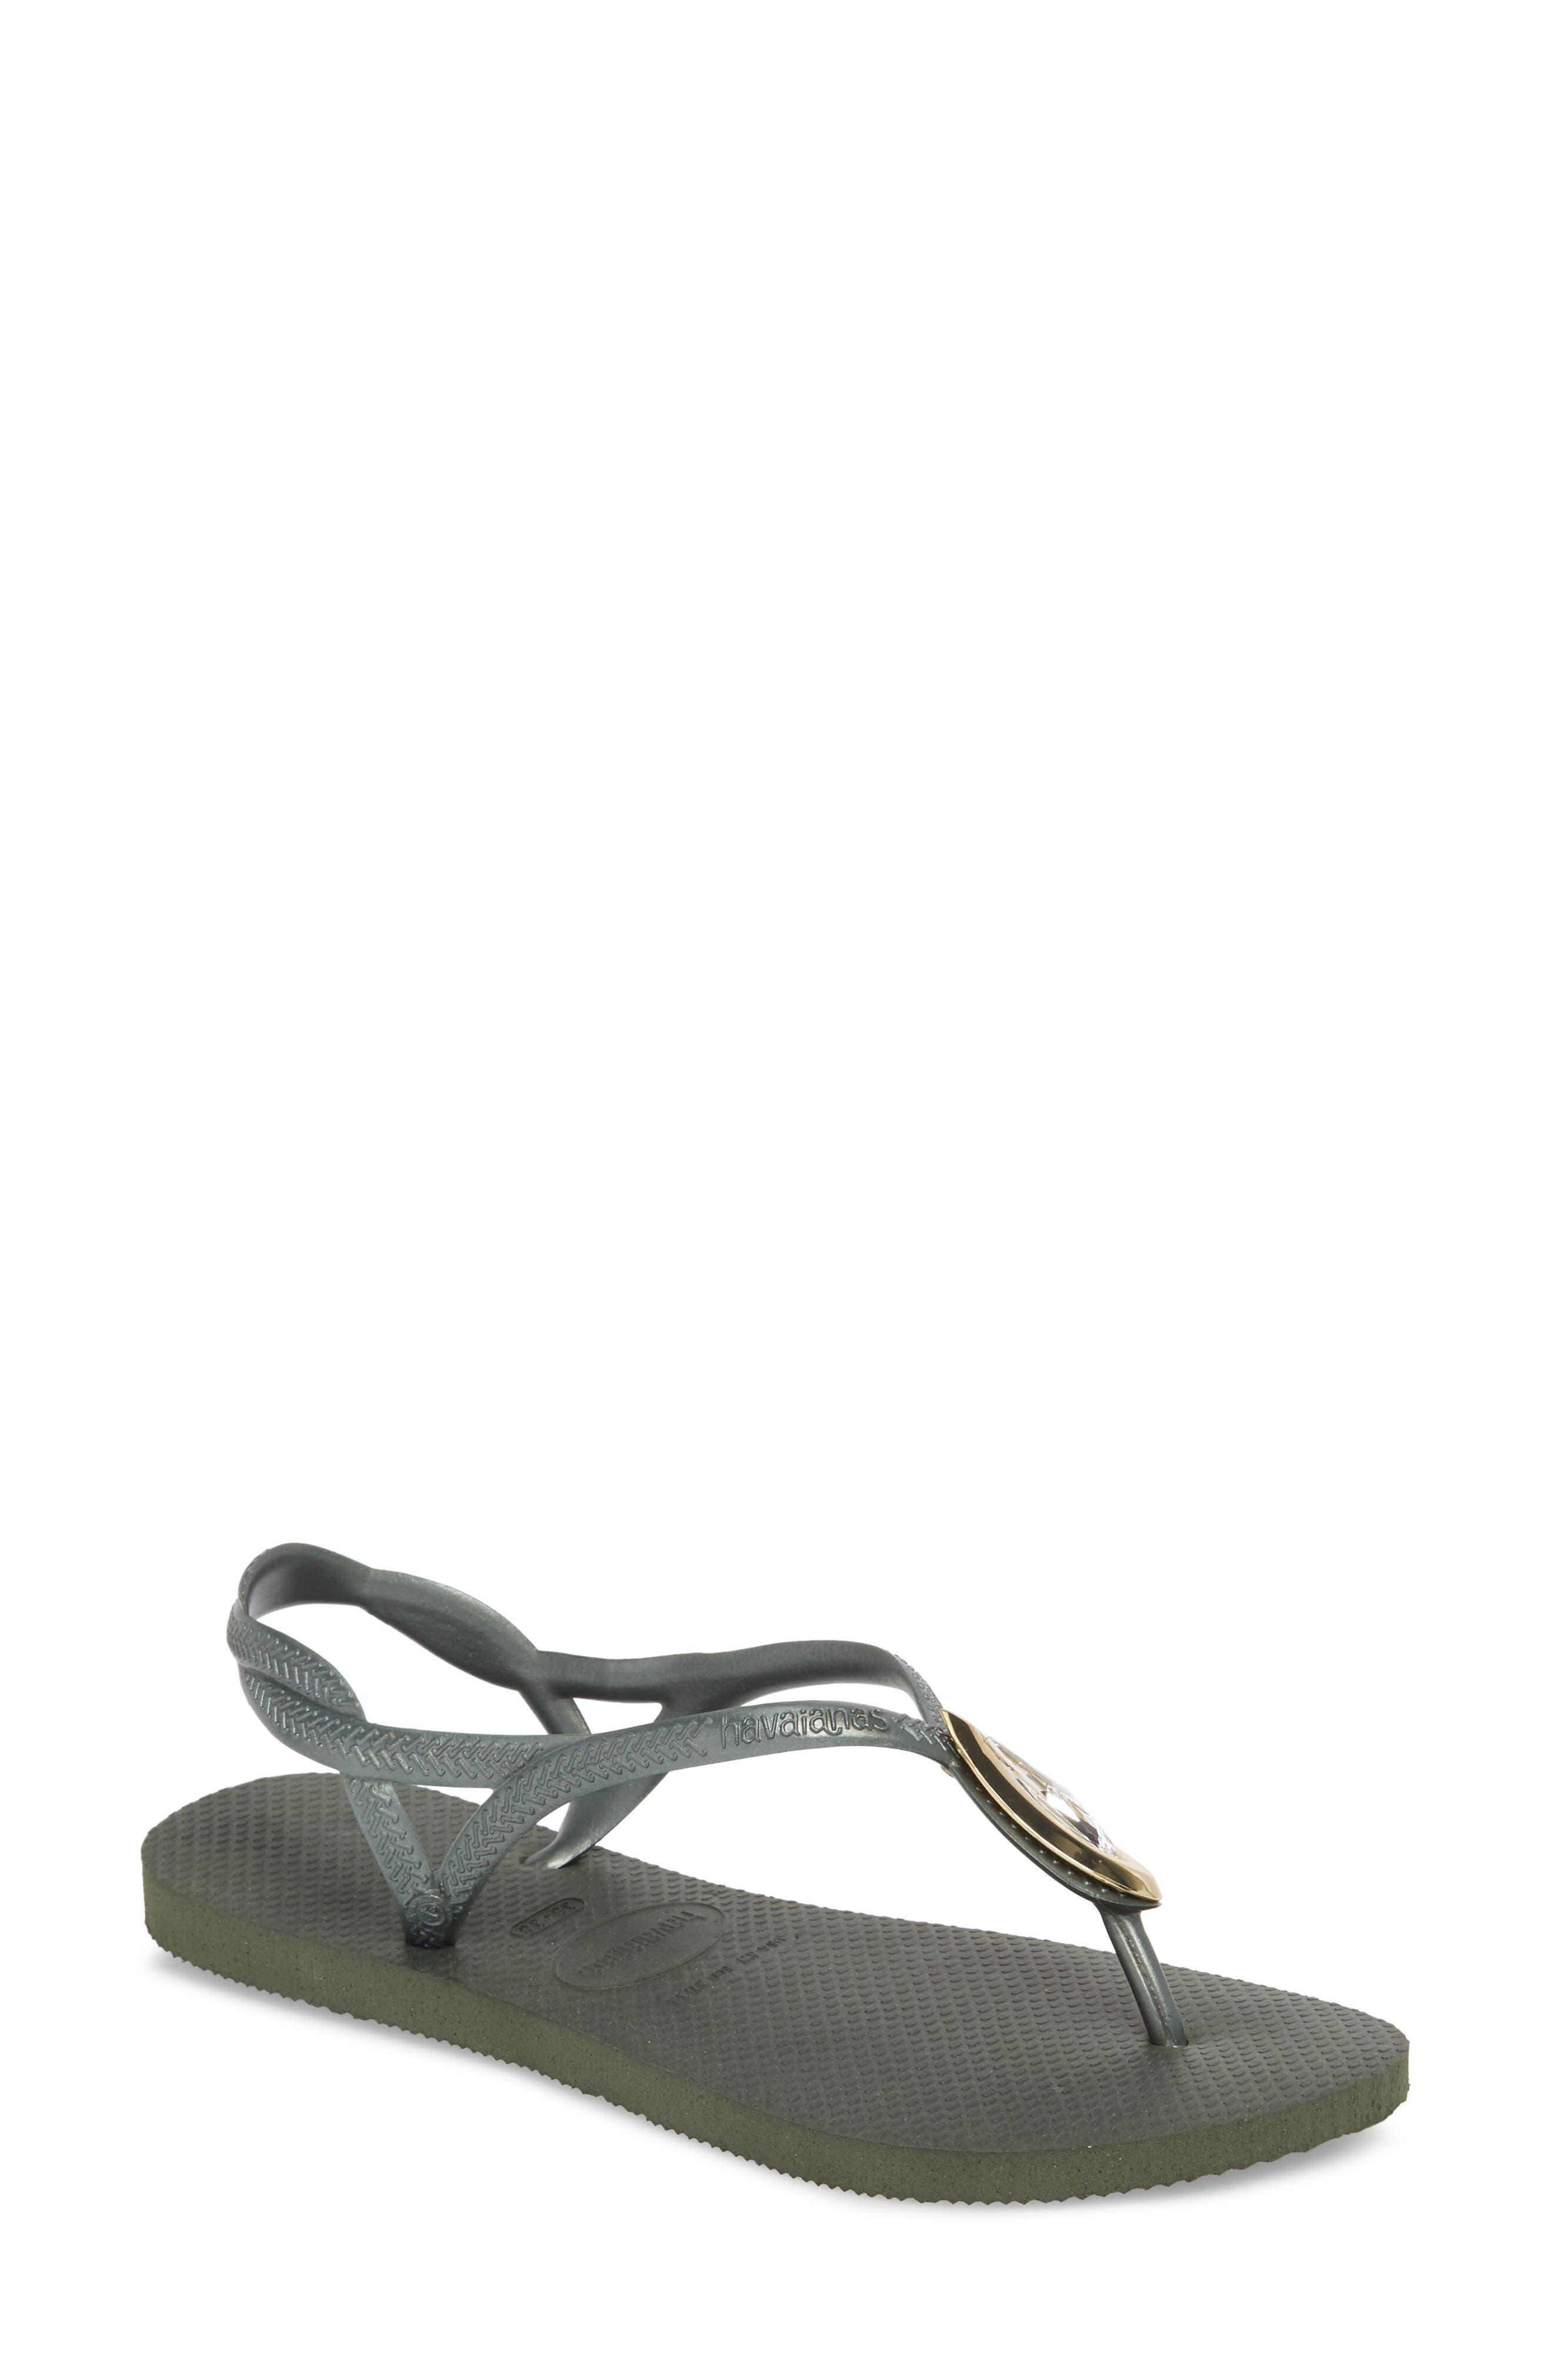 HAVAIANAS Luna Sandal in Green Olive